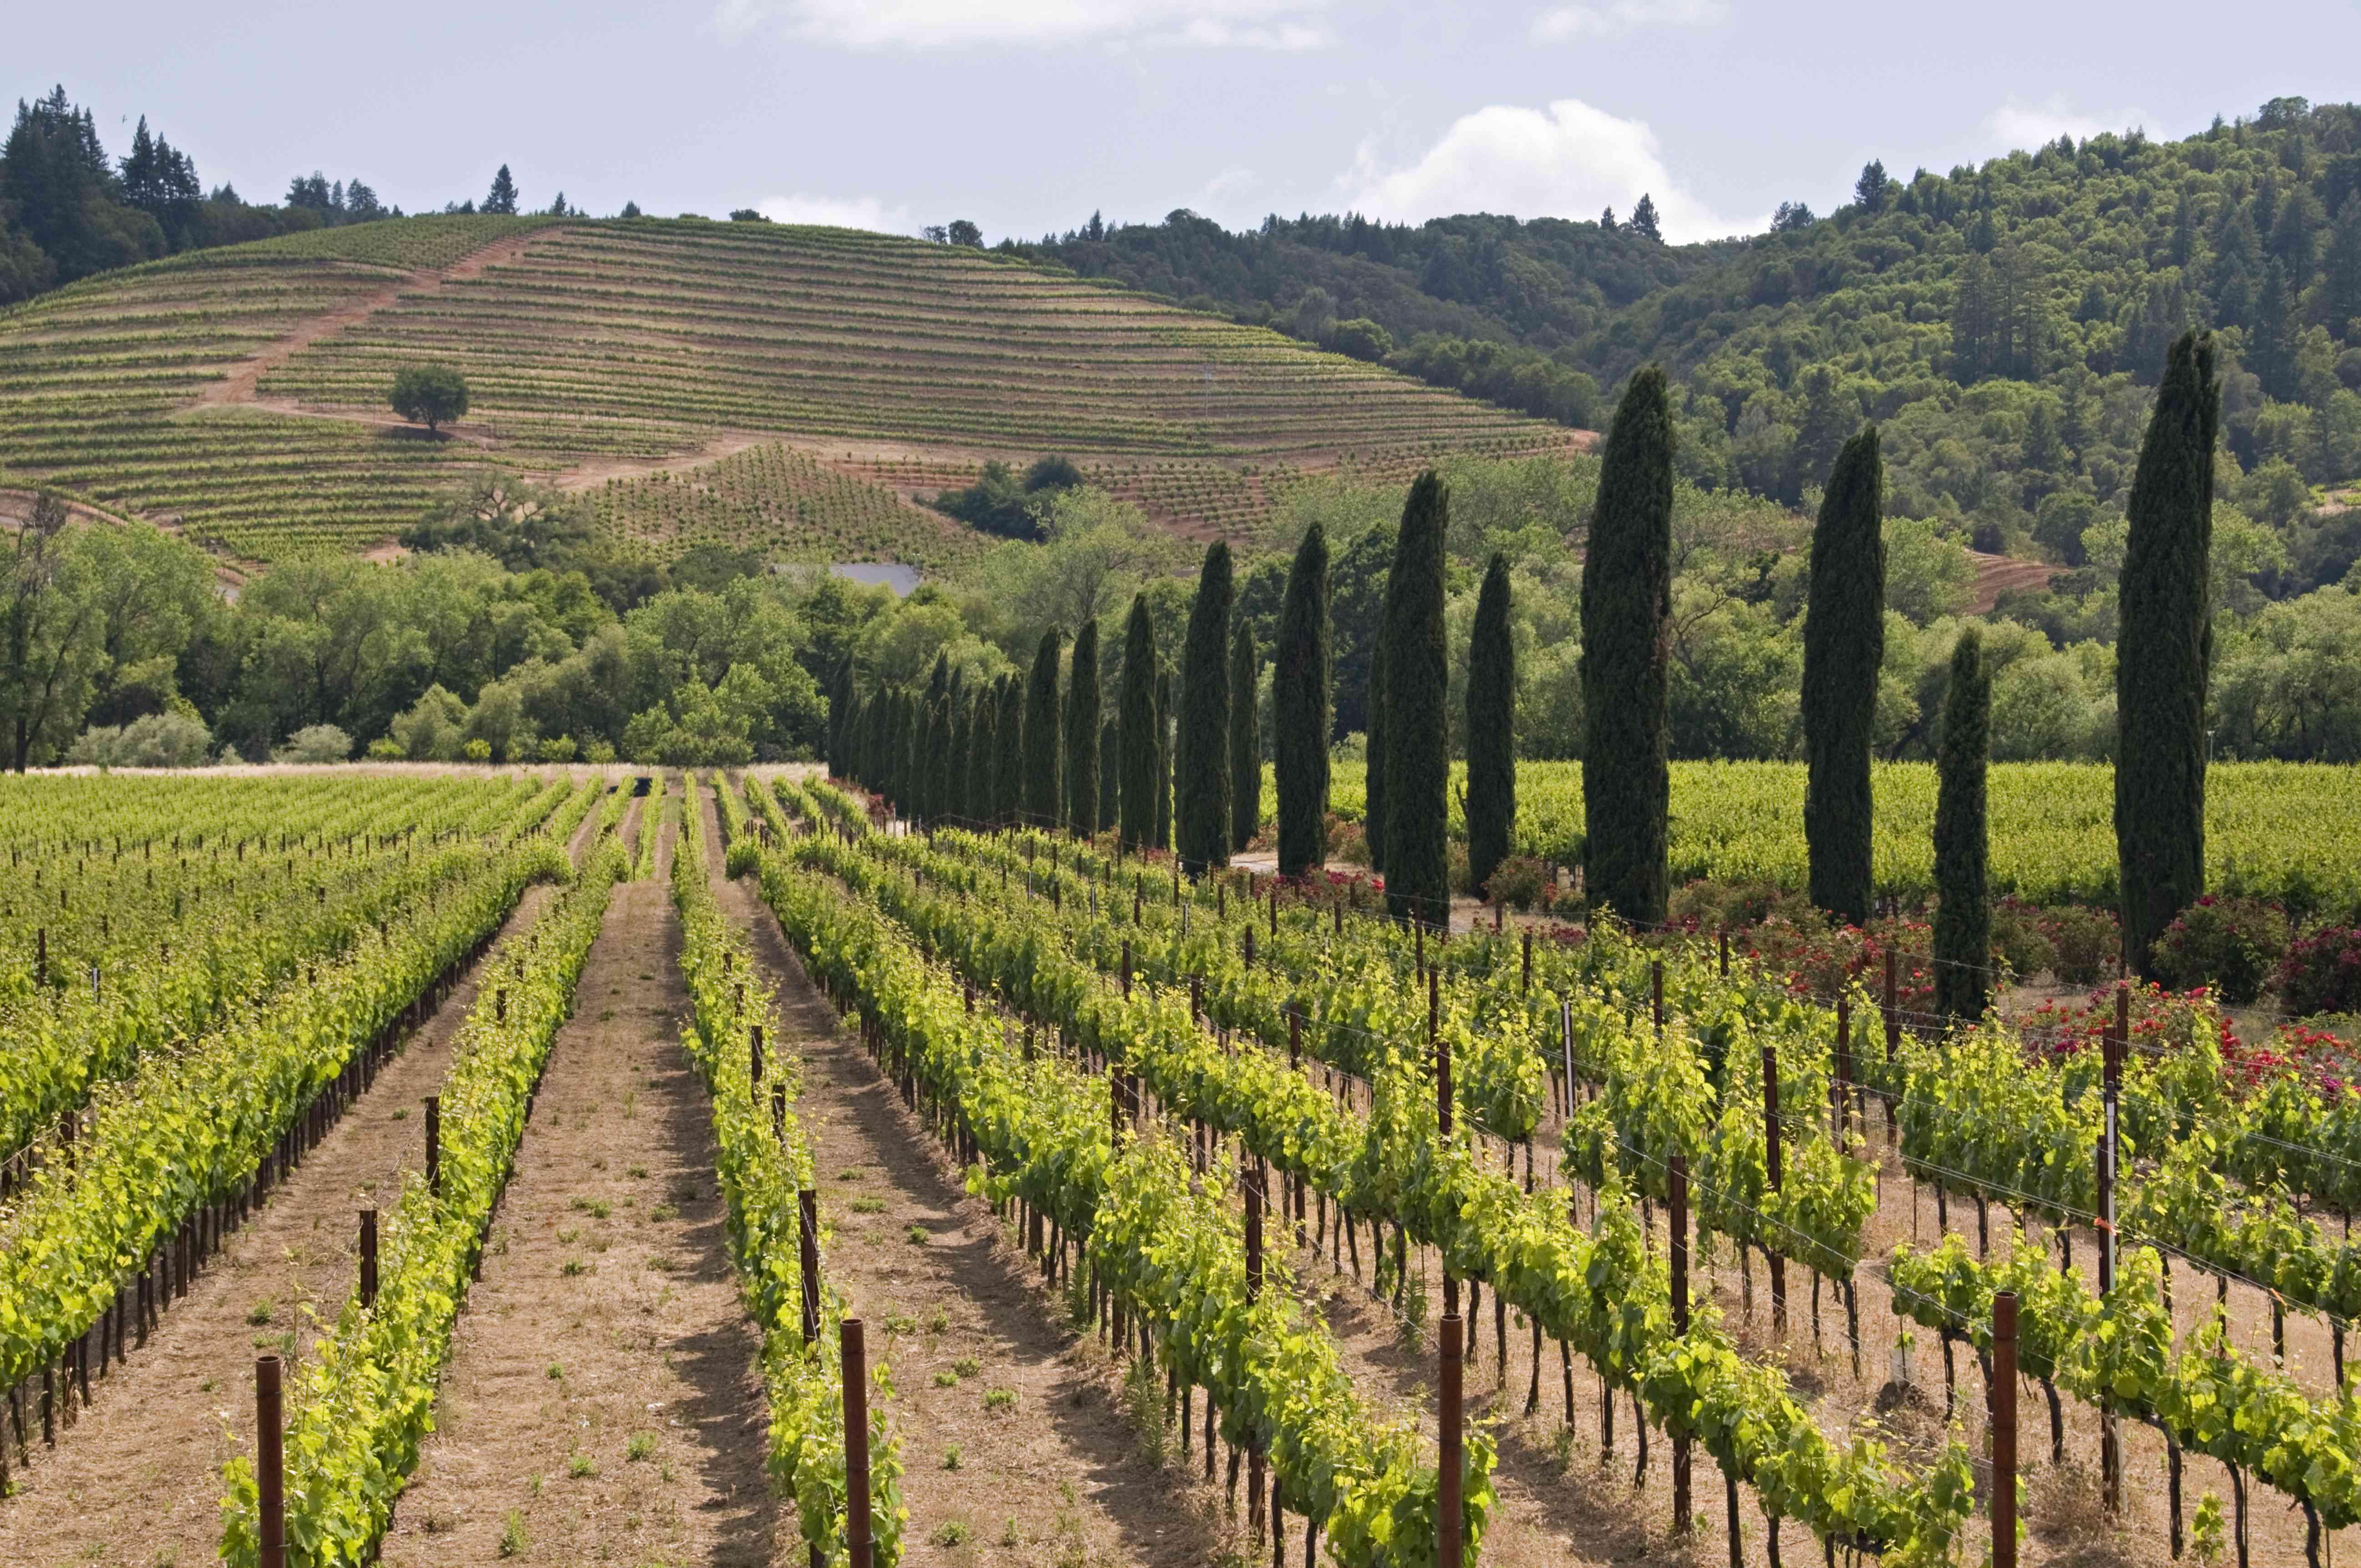 Ferrari Carano Vineyard and Winery near Healdsburg, Sonoma County, northern California, USA